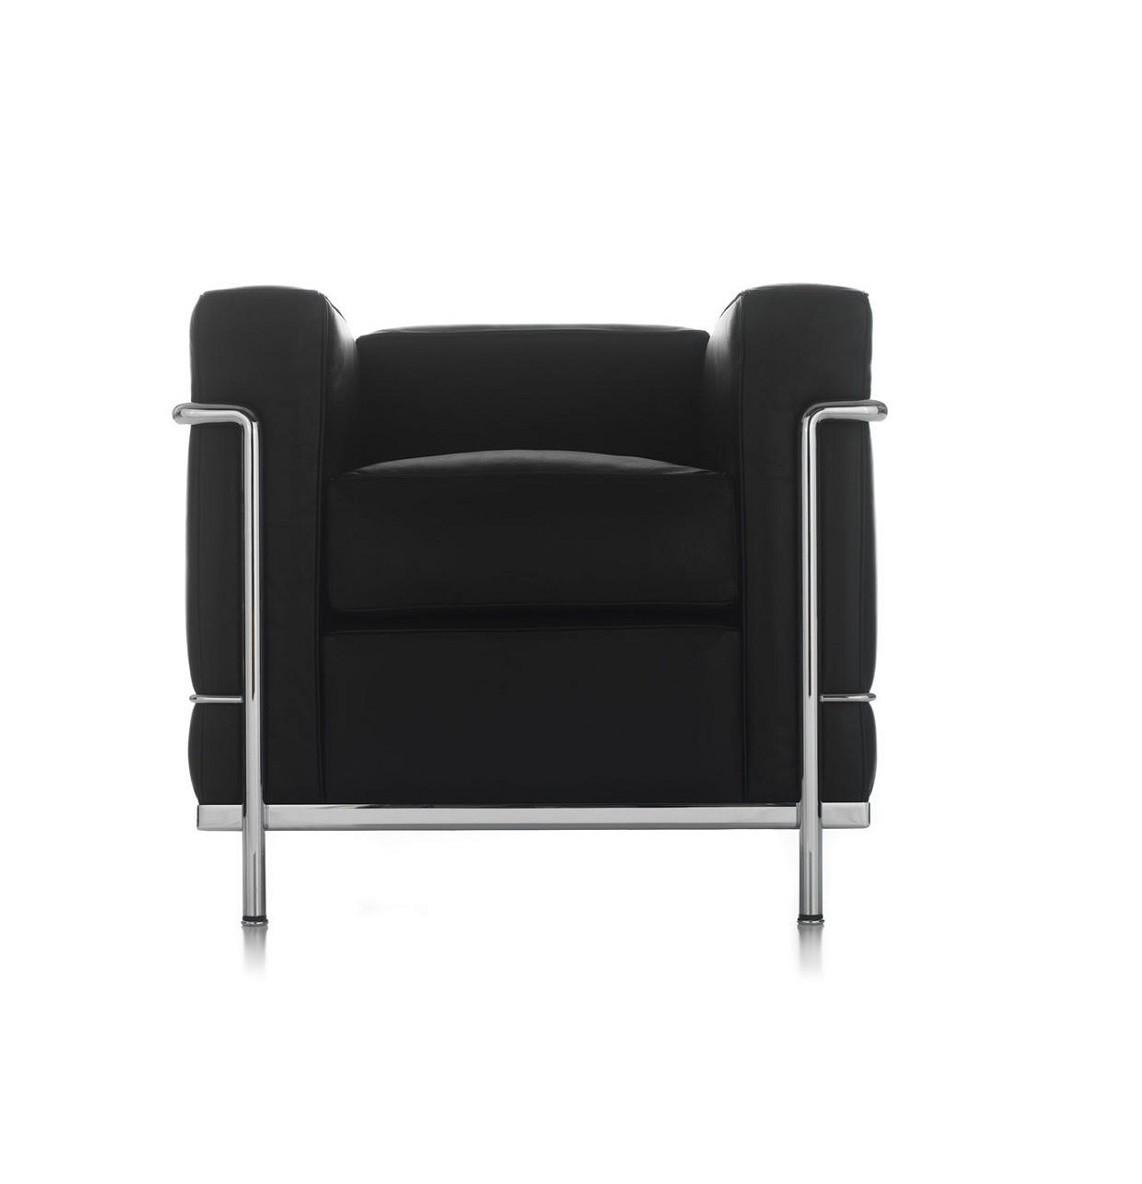 Poltrona Le Corbusier.Noleggio Poltrona Mod Le Corbusier